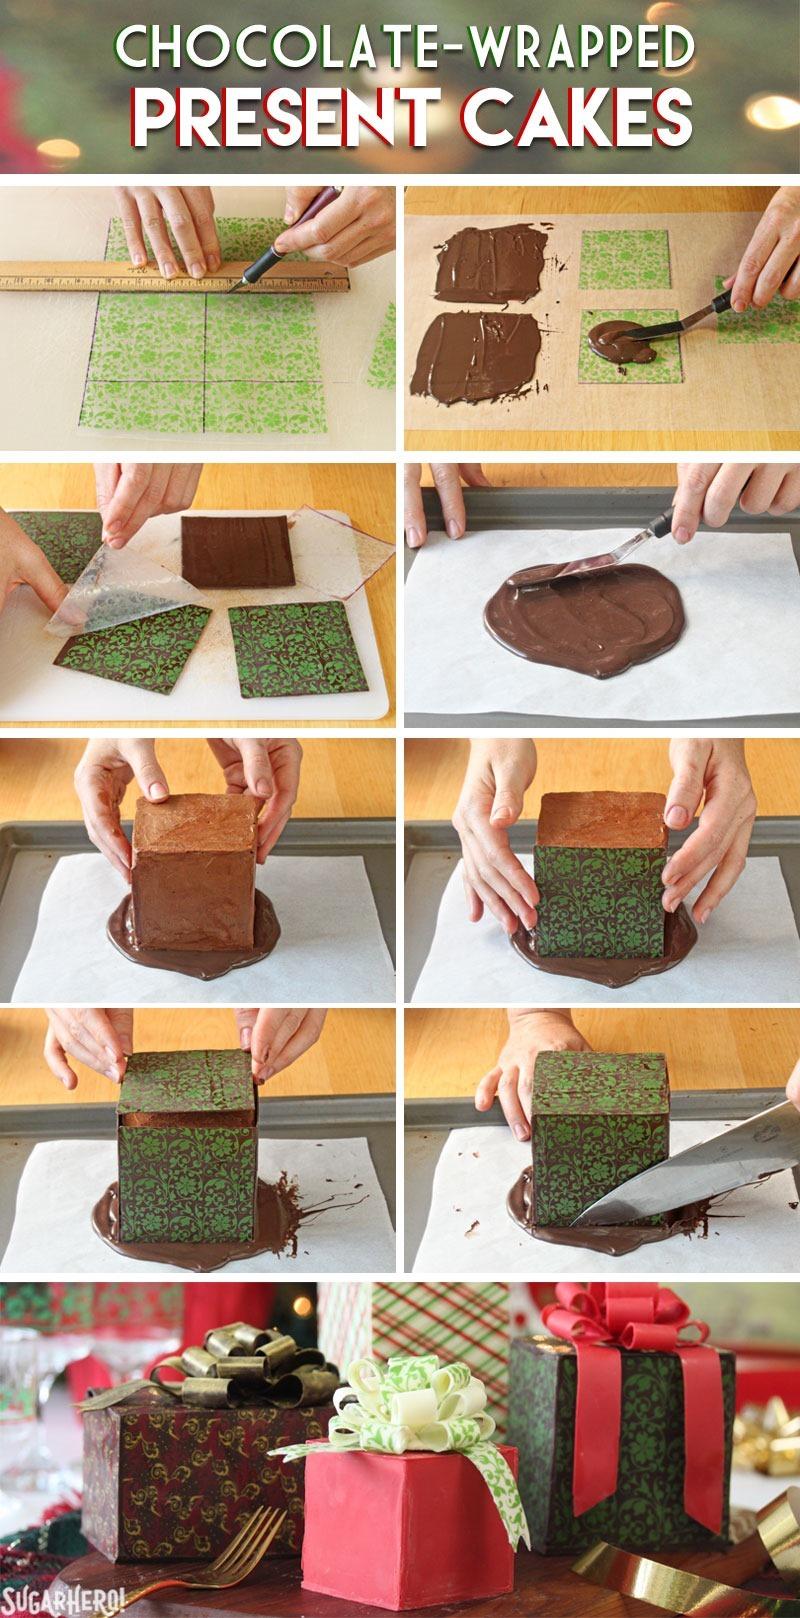 How to Make Chocolate-Wrapped Present Cakes | From SugarHero.com